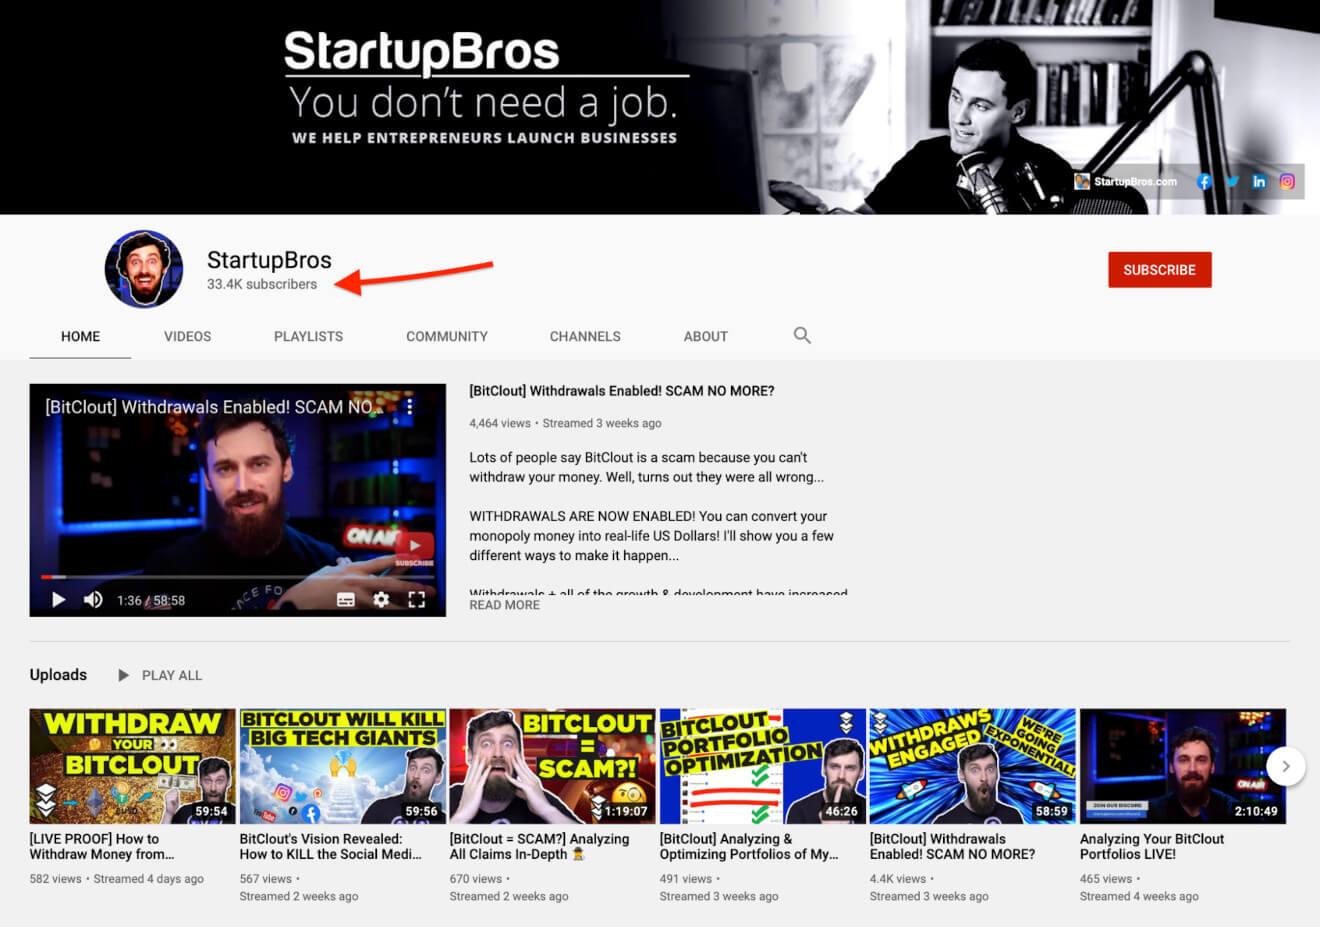 startupbros youtube videos